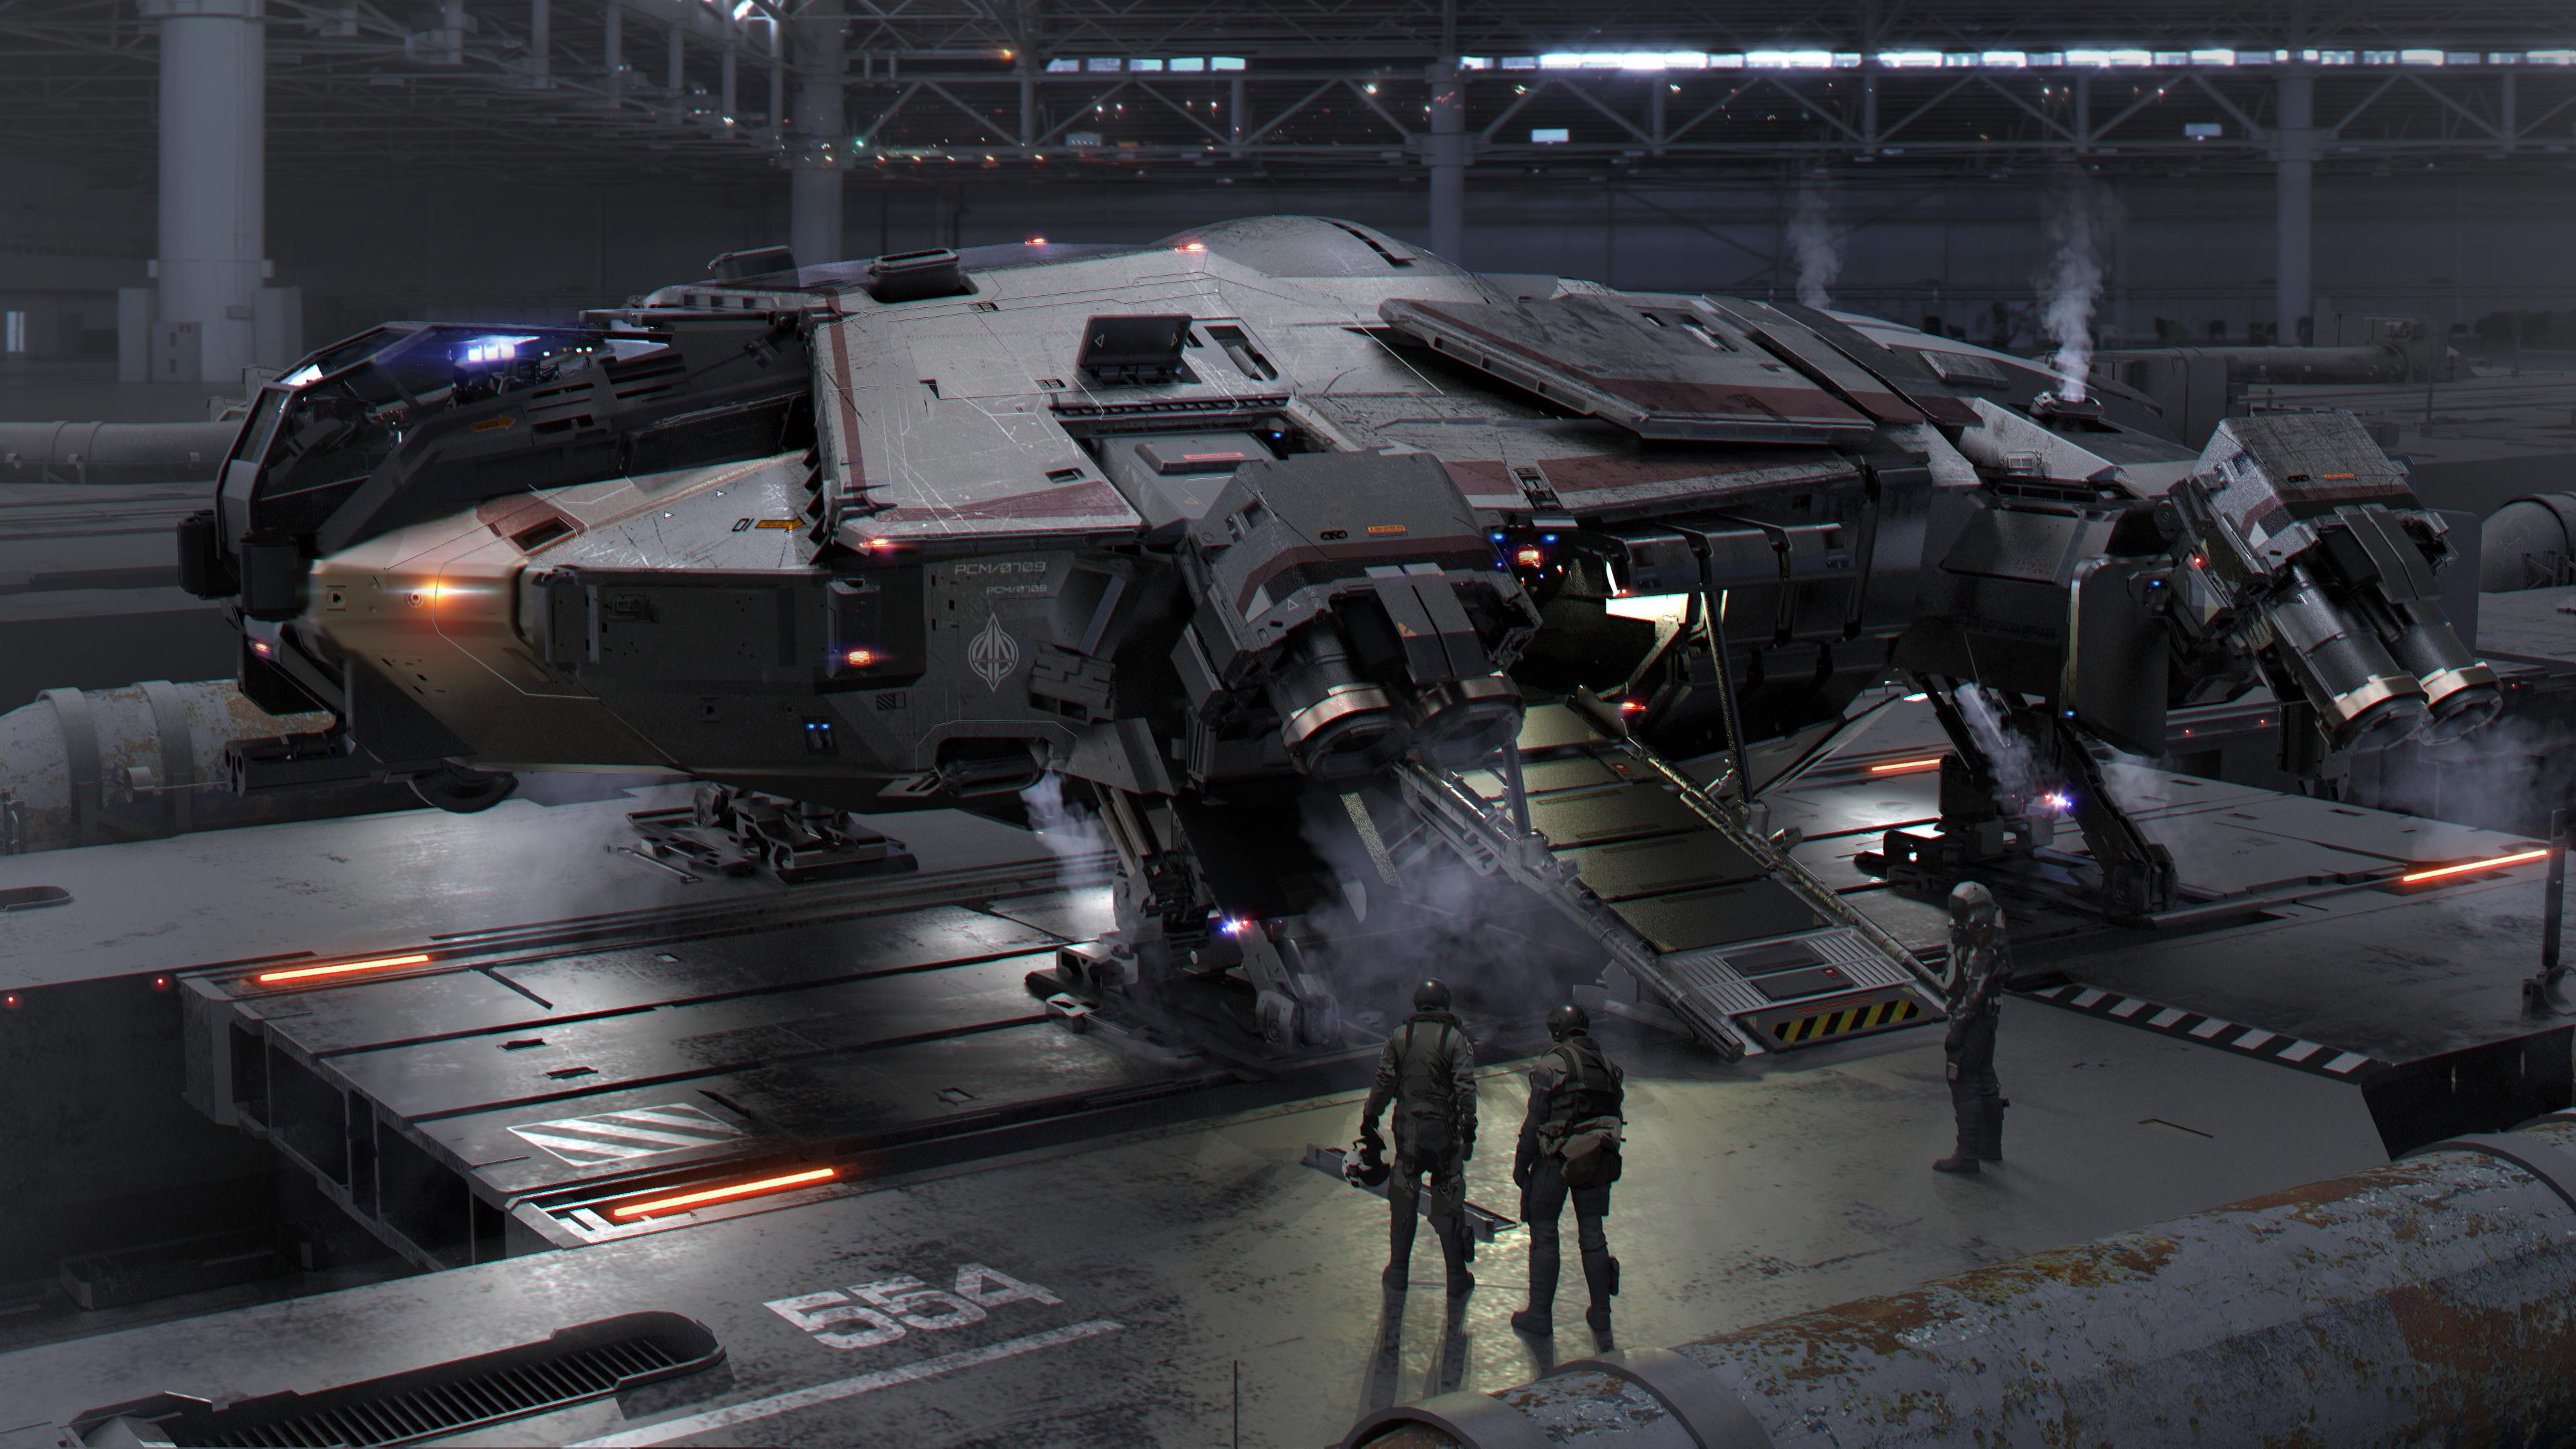 Anvil_Terrapin_Piece_01_Hangar.jpg